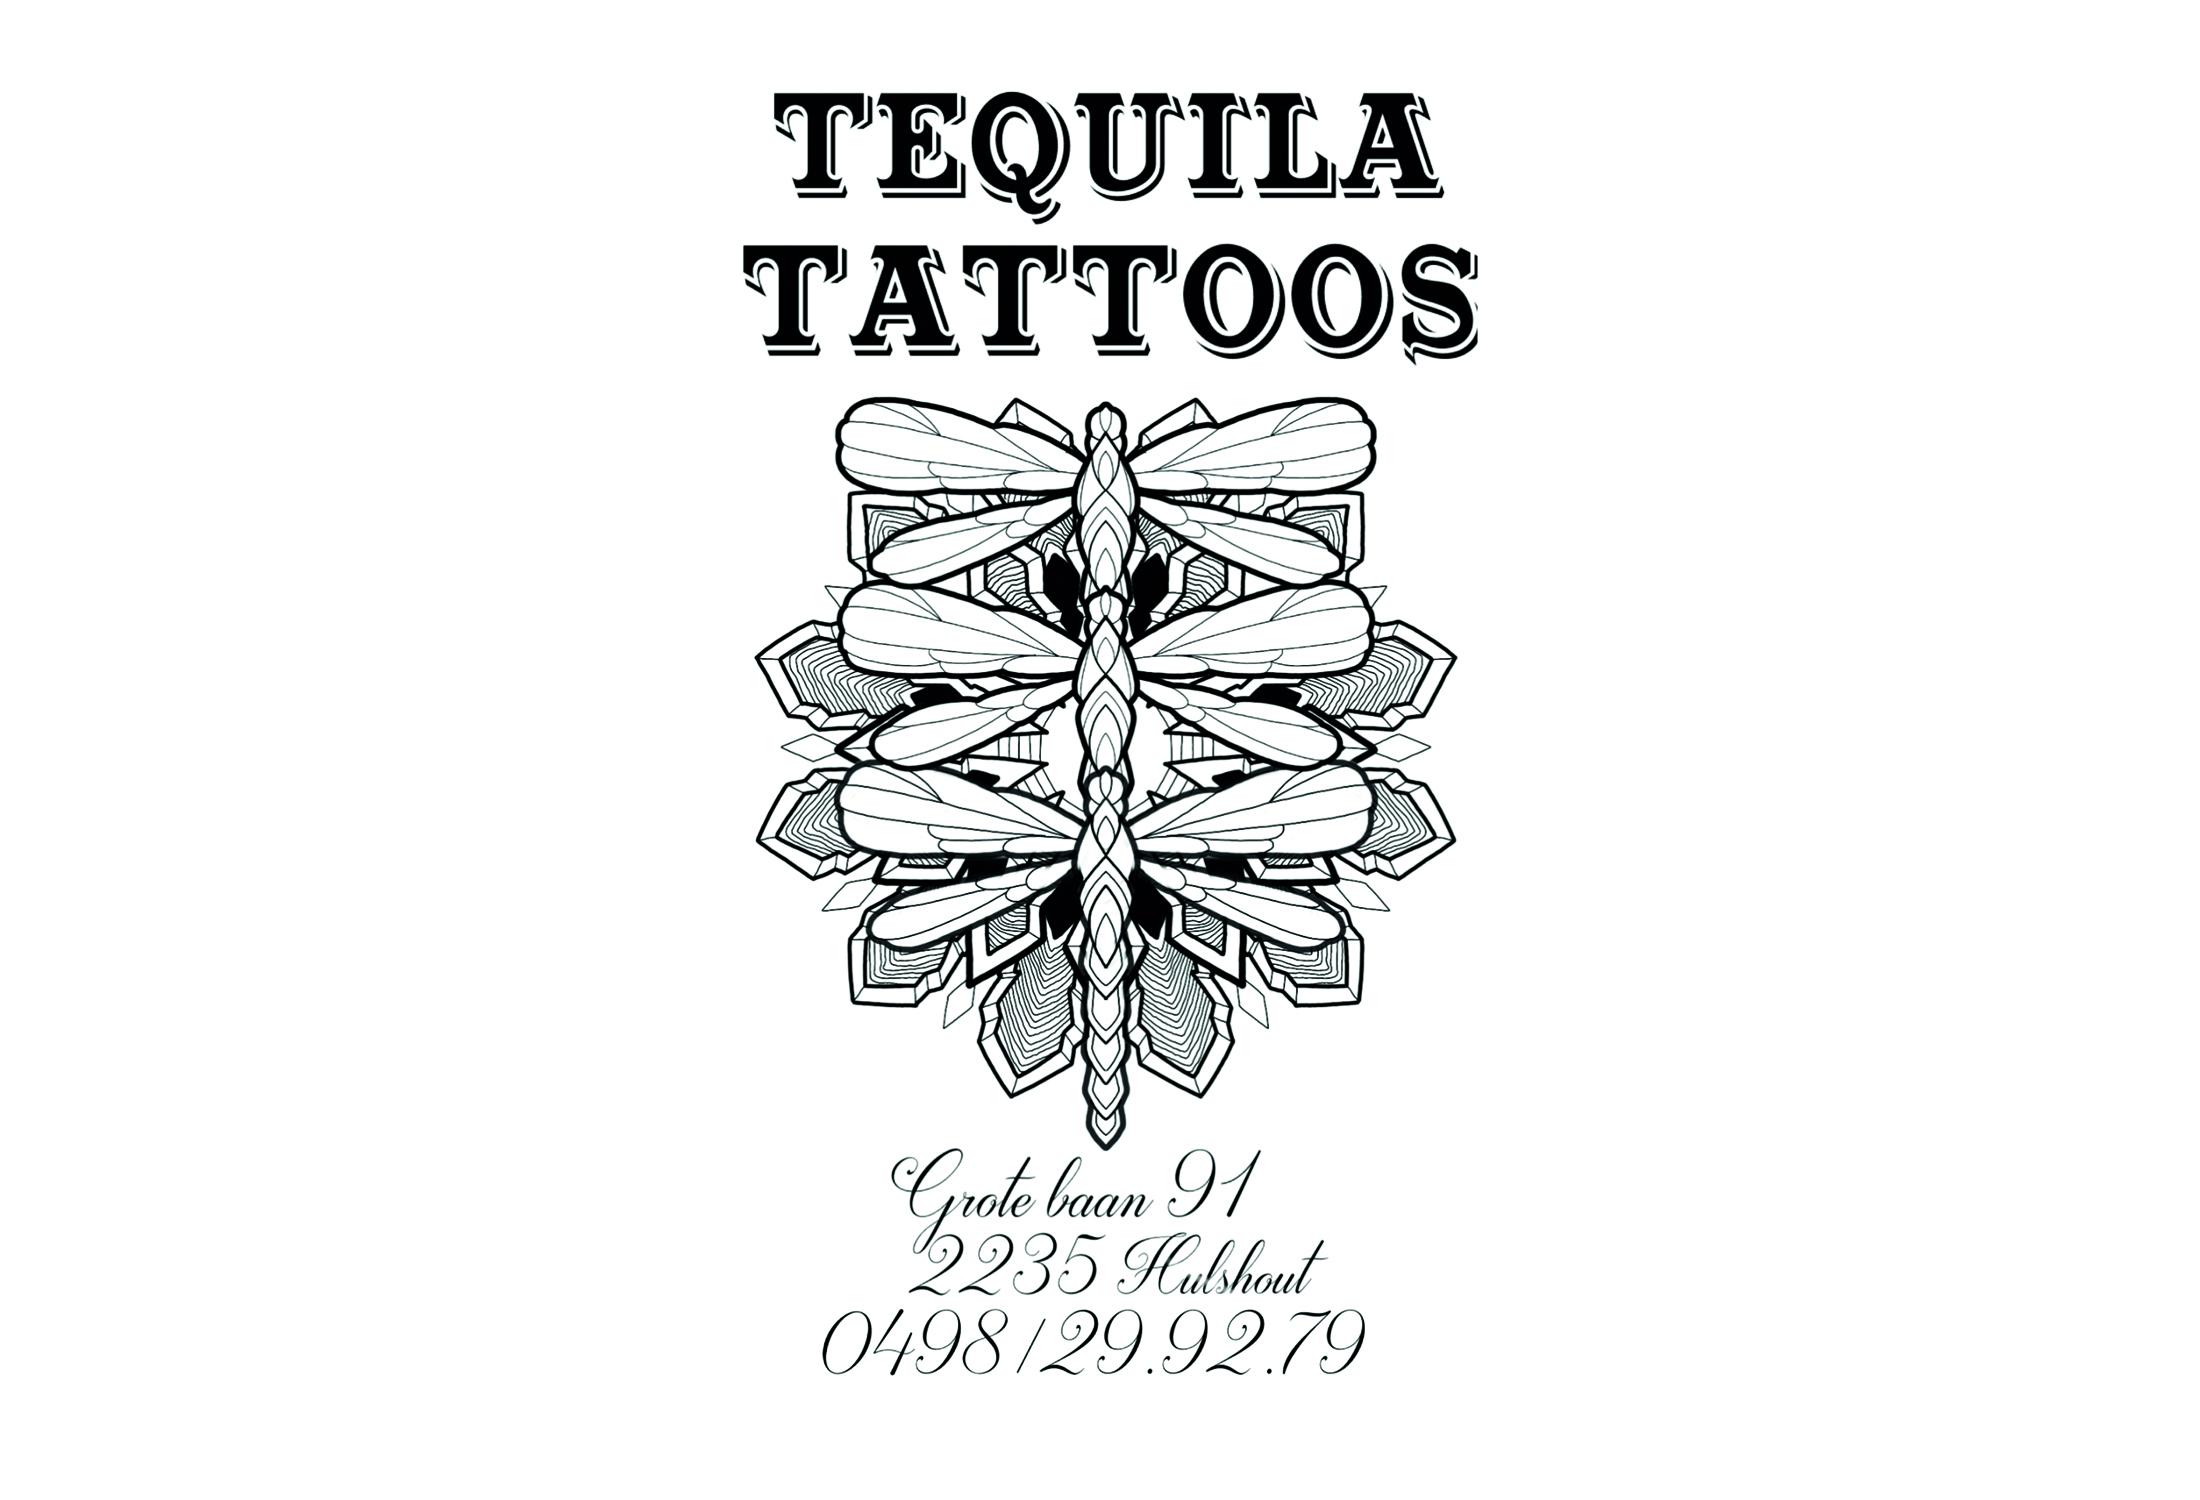 Tequila Tattoos.jpg